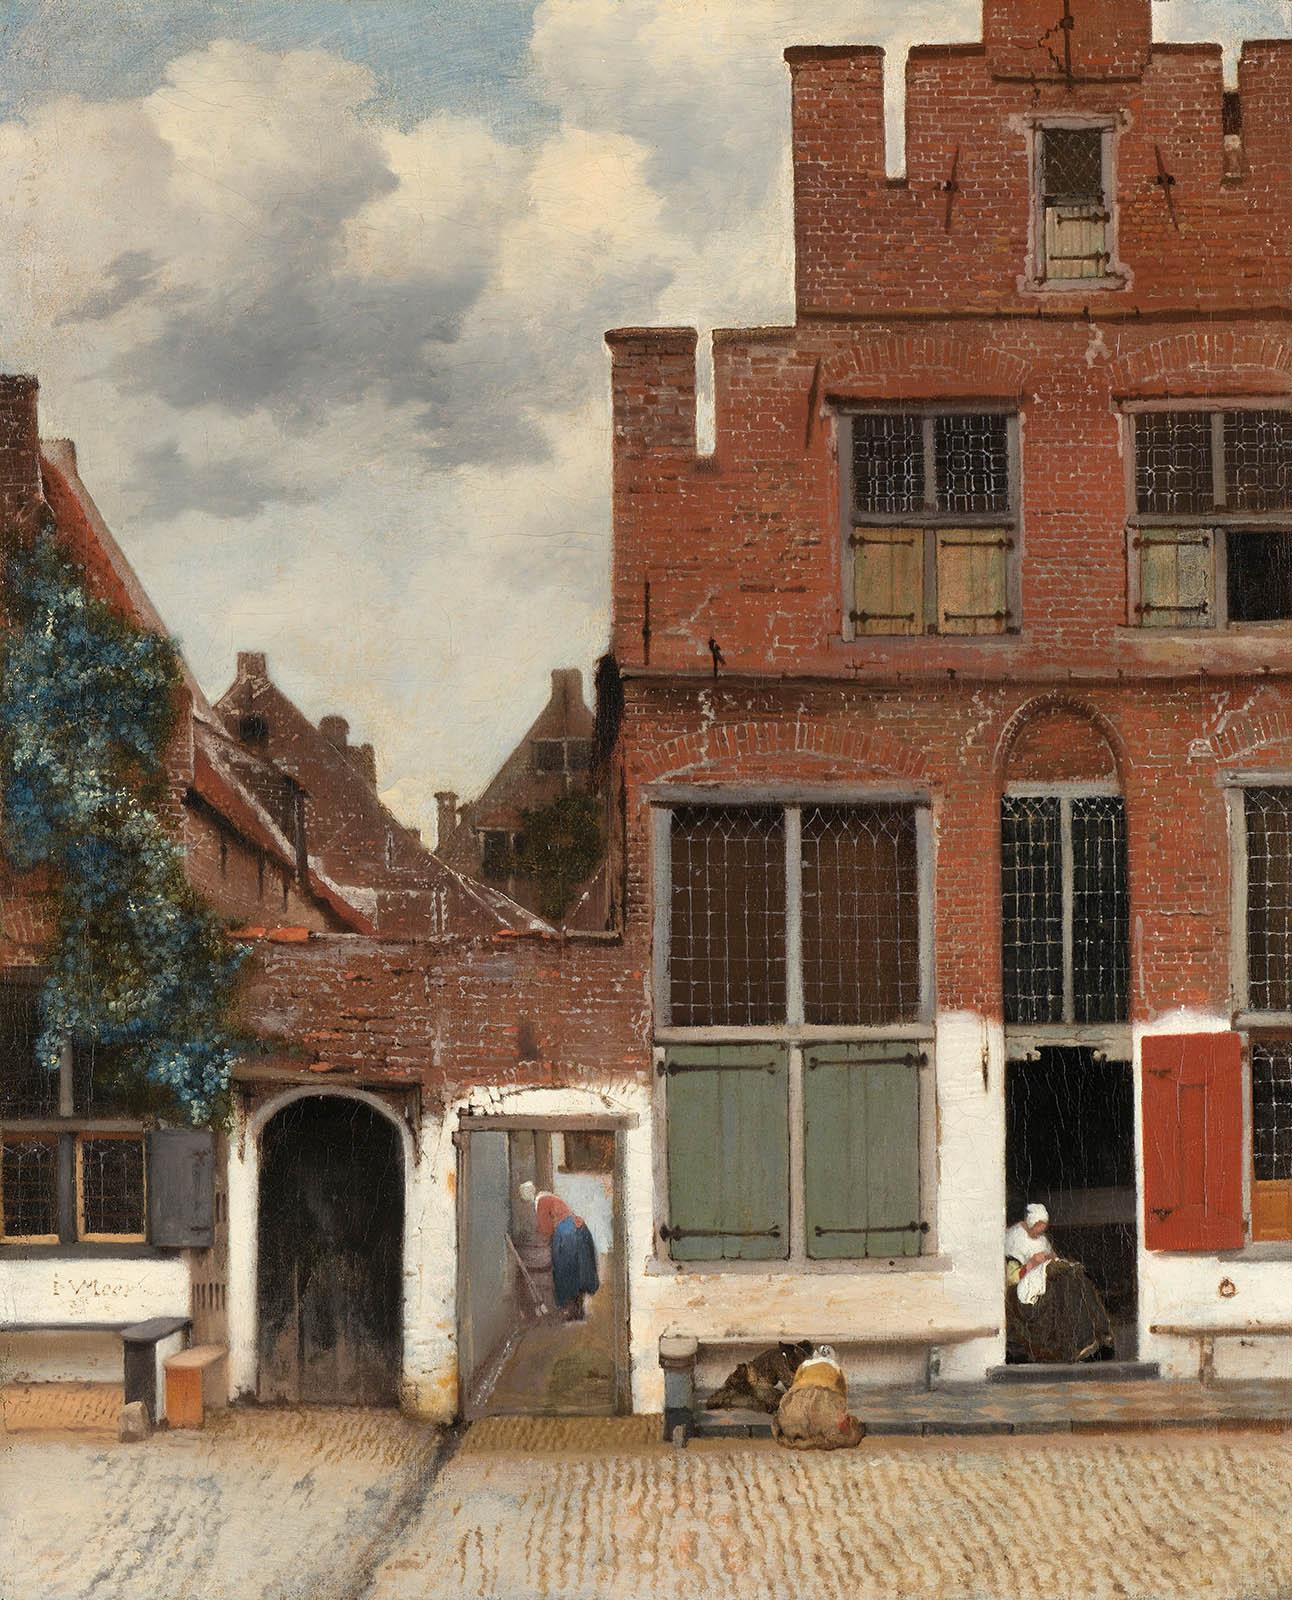 Johannes Vermeer. La callejuela. Hacia 1568. Rijksmuseum. Amsterdam.